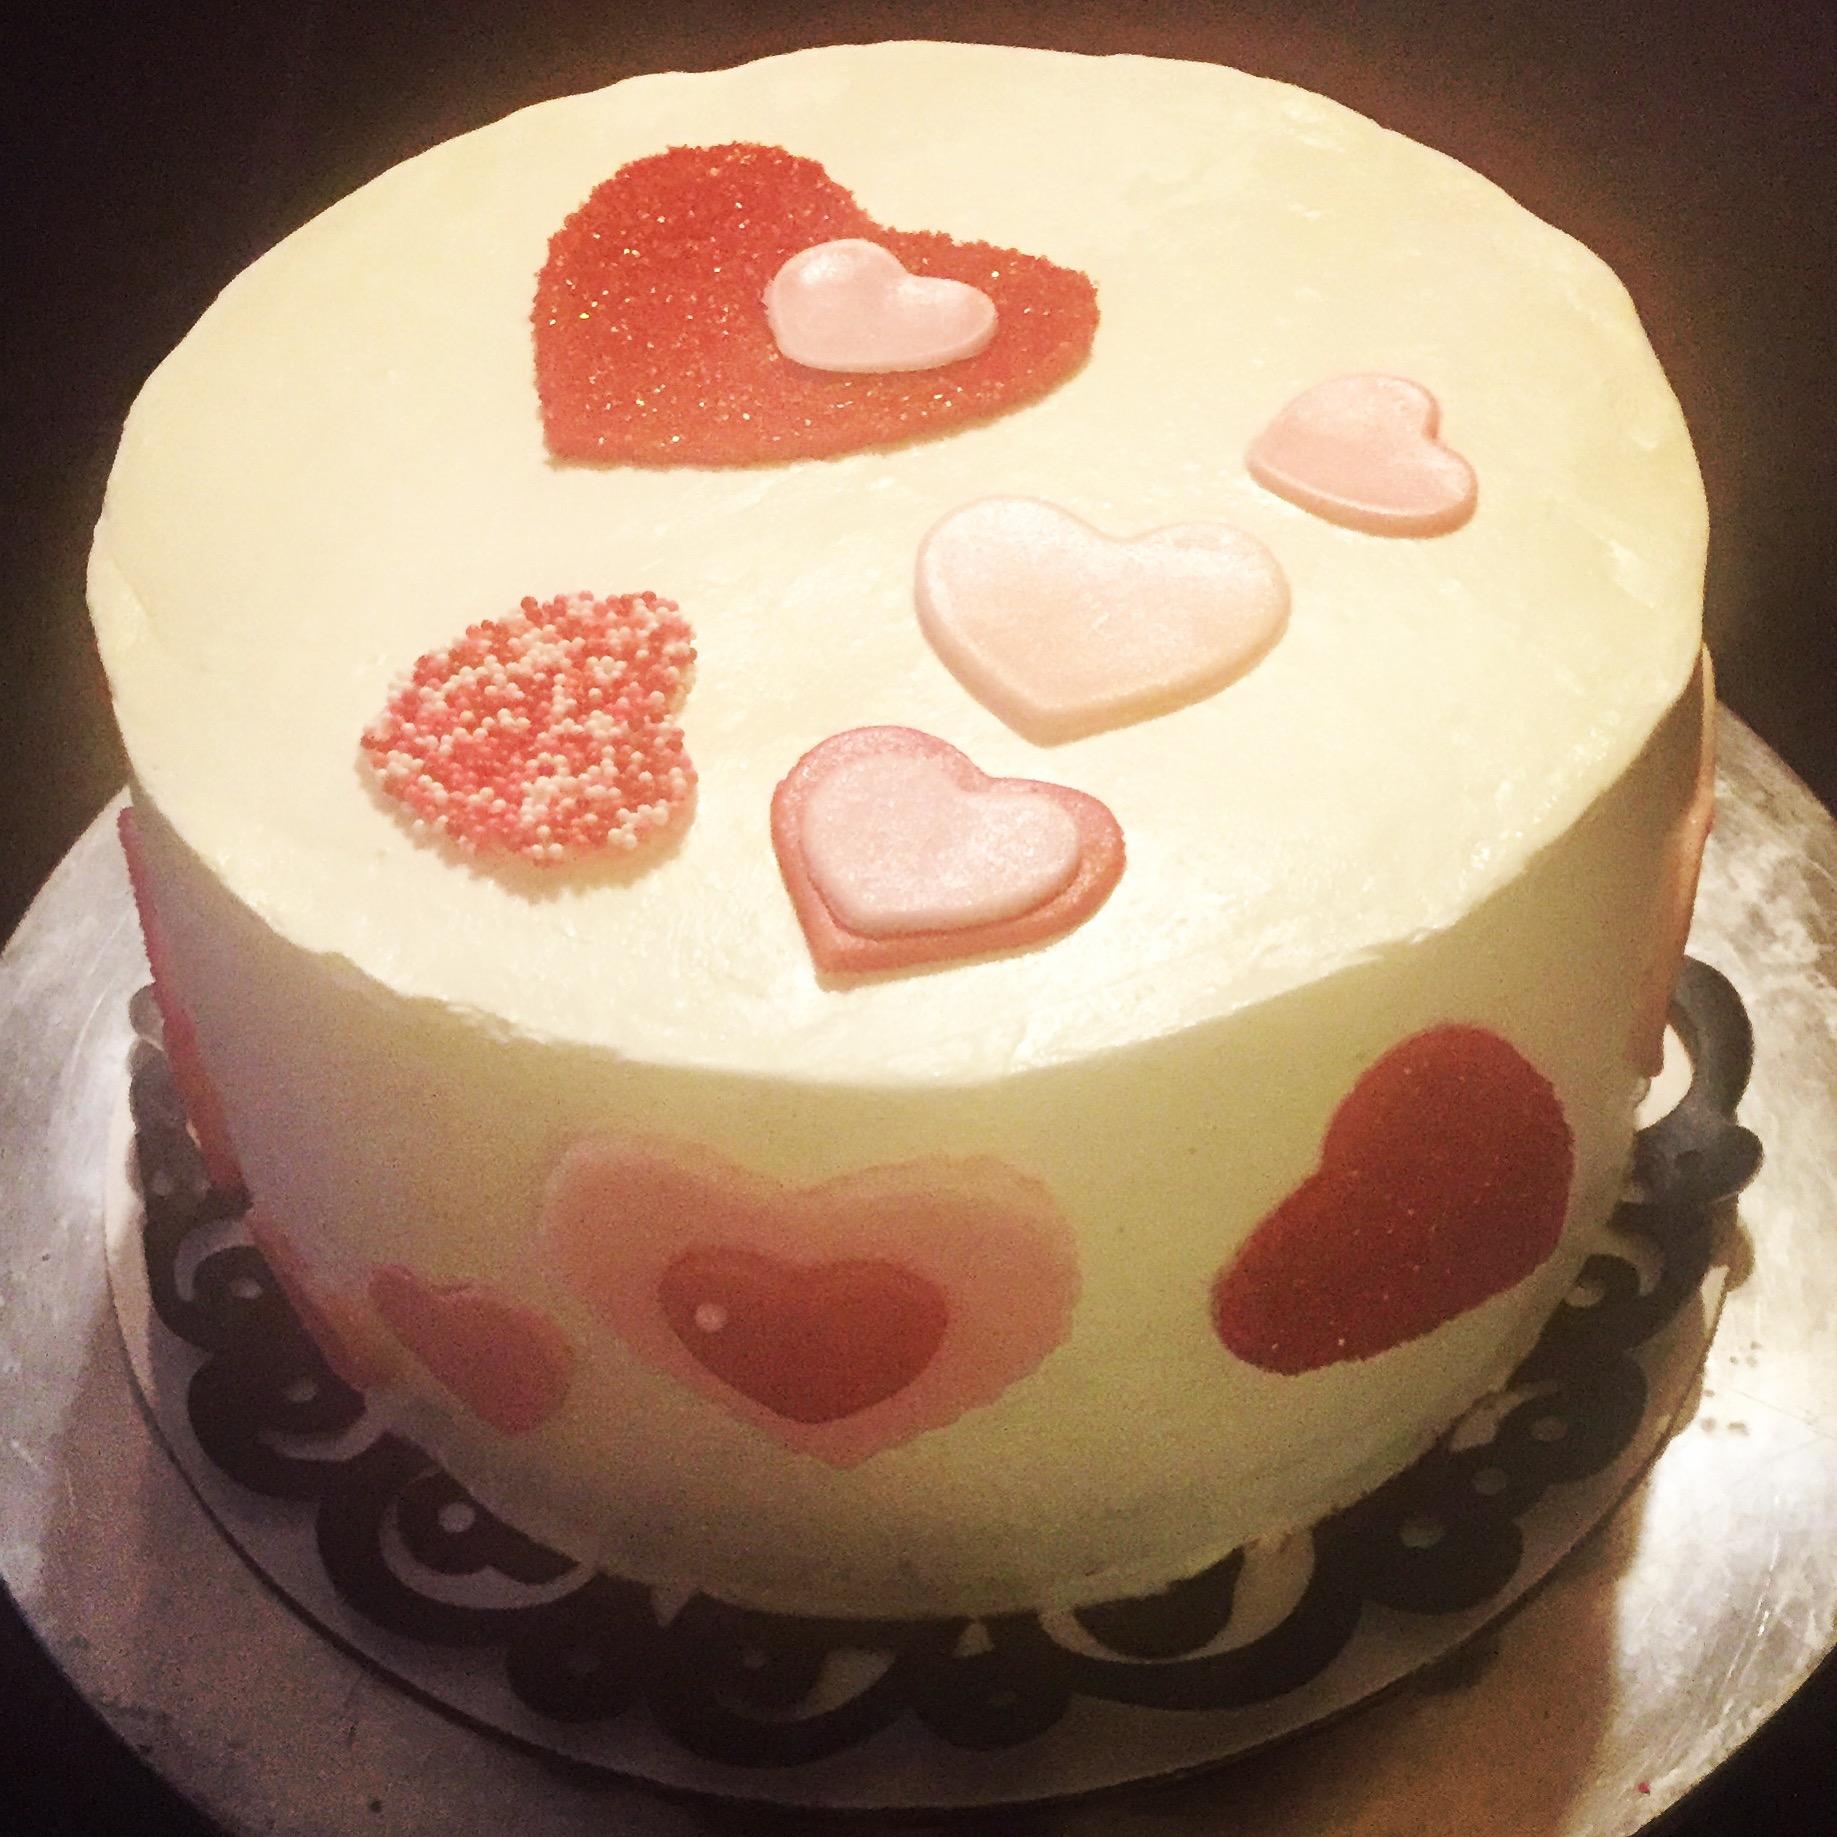 Vanilla Cream Cake filled with Cookies n' Cream